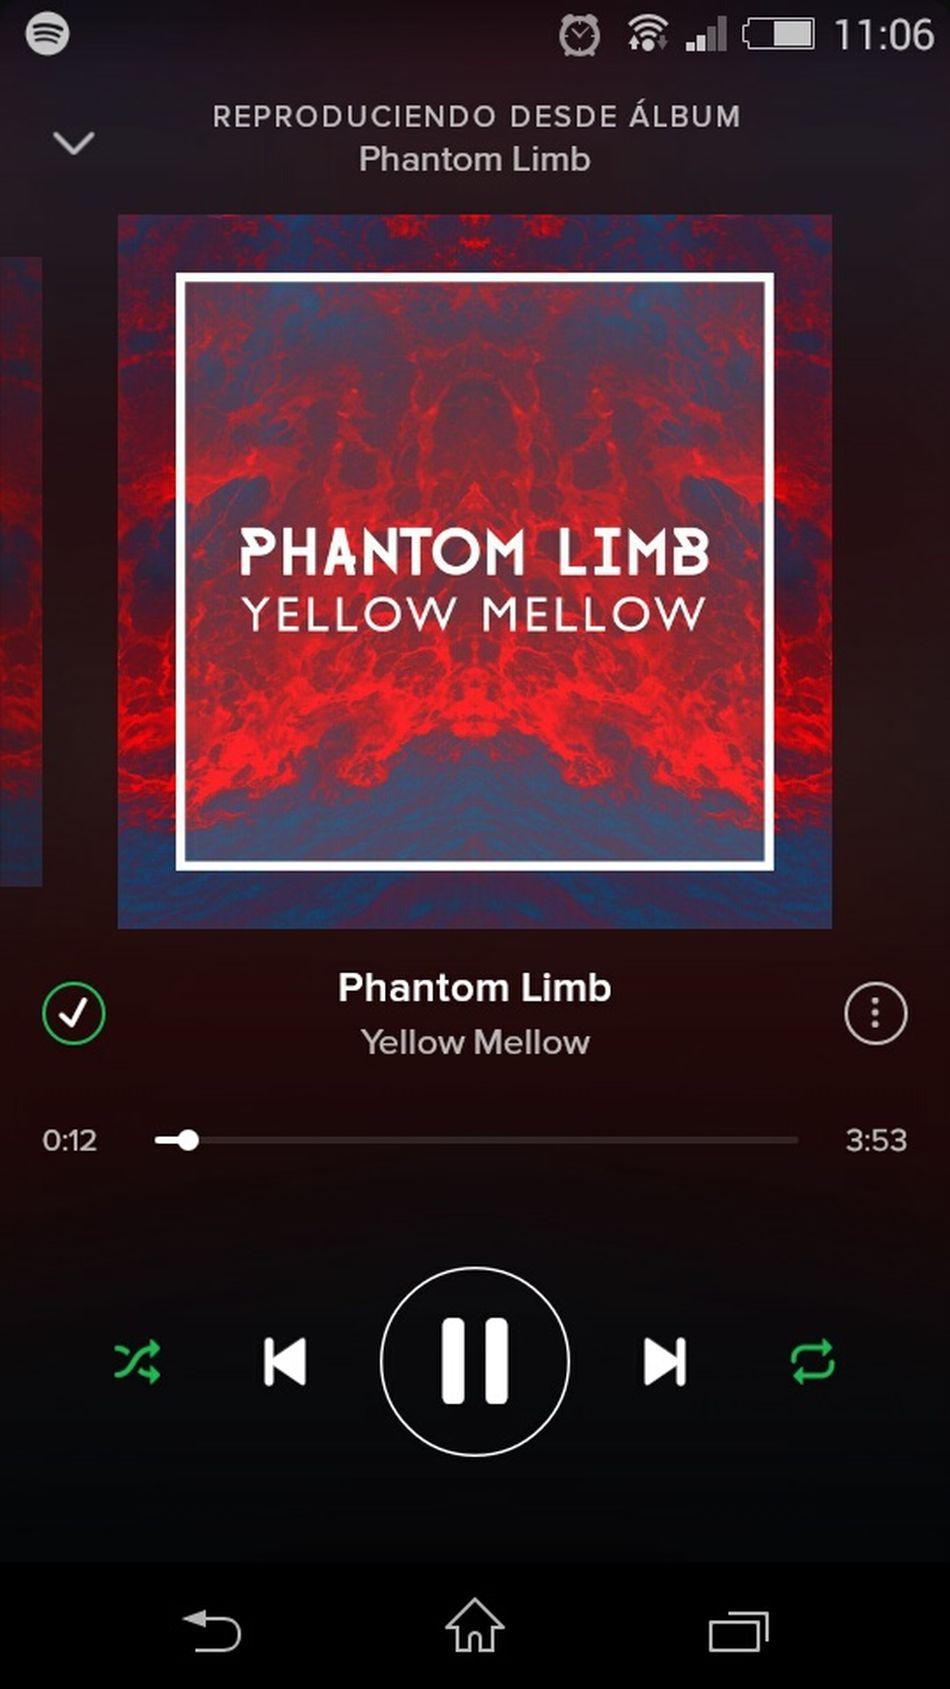 Yellowmellowmg Relaxing Check This Out PhantomLimb Spotify